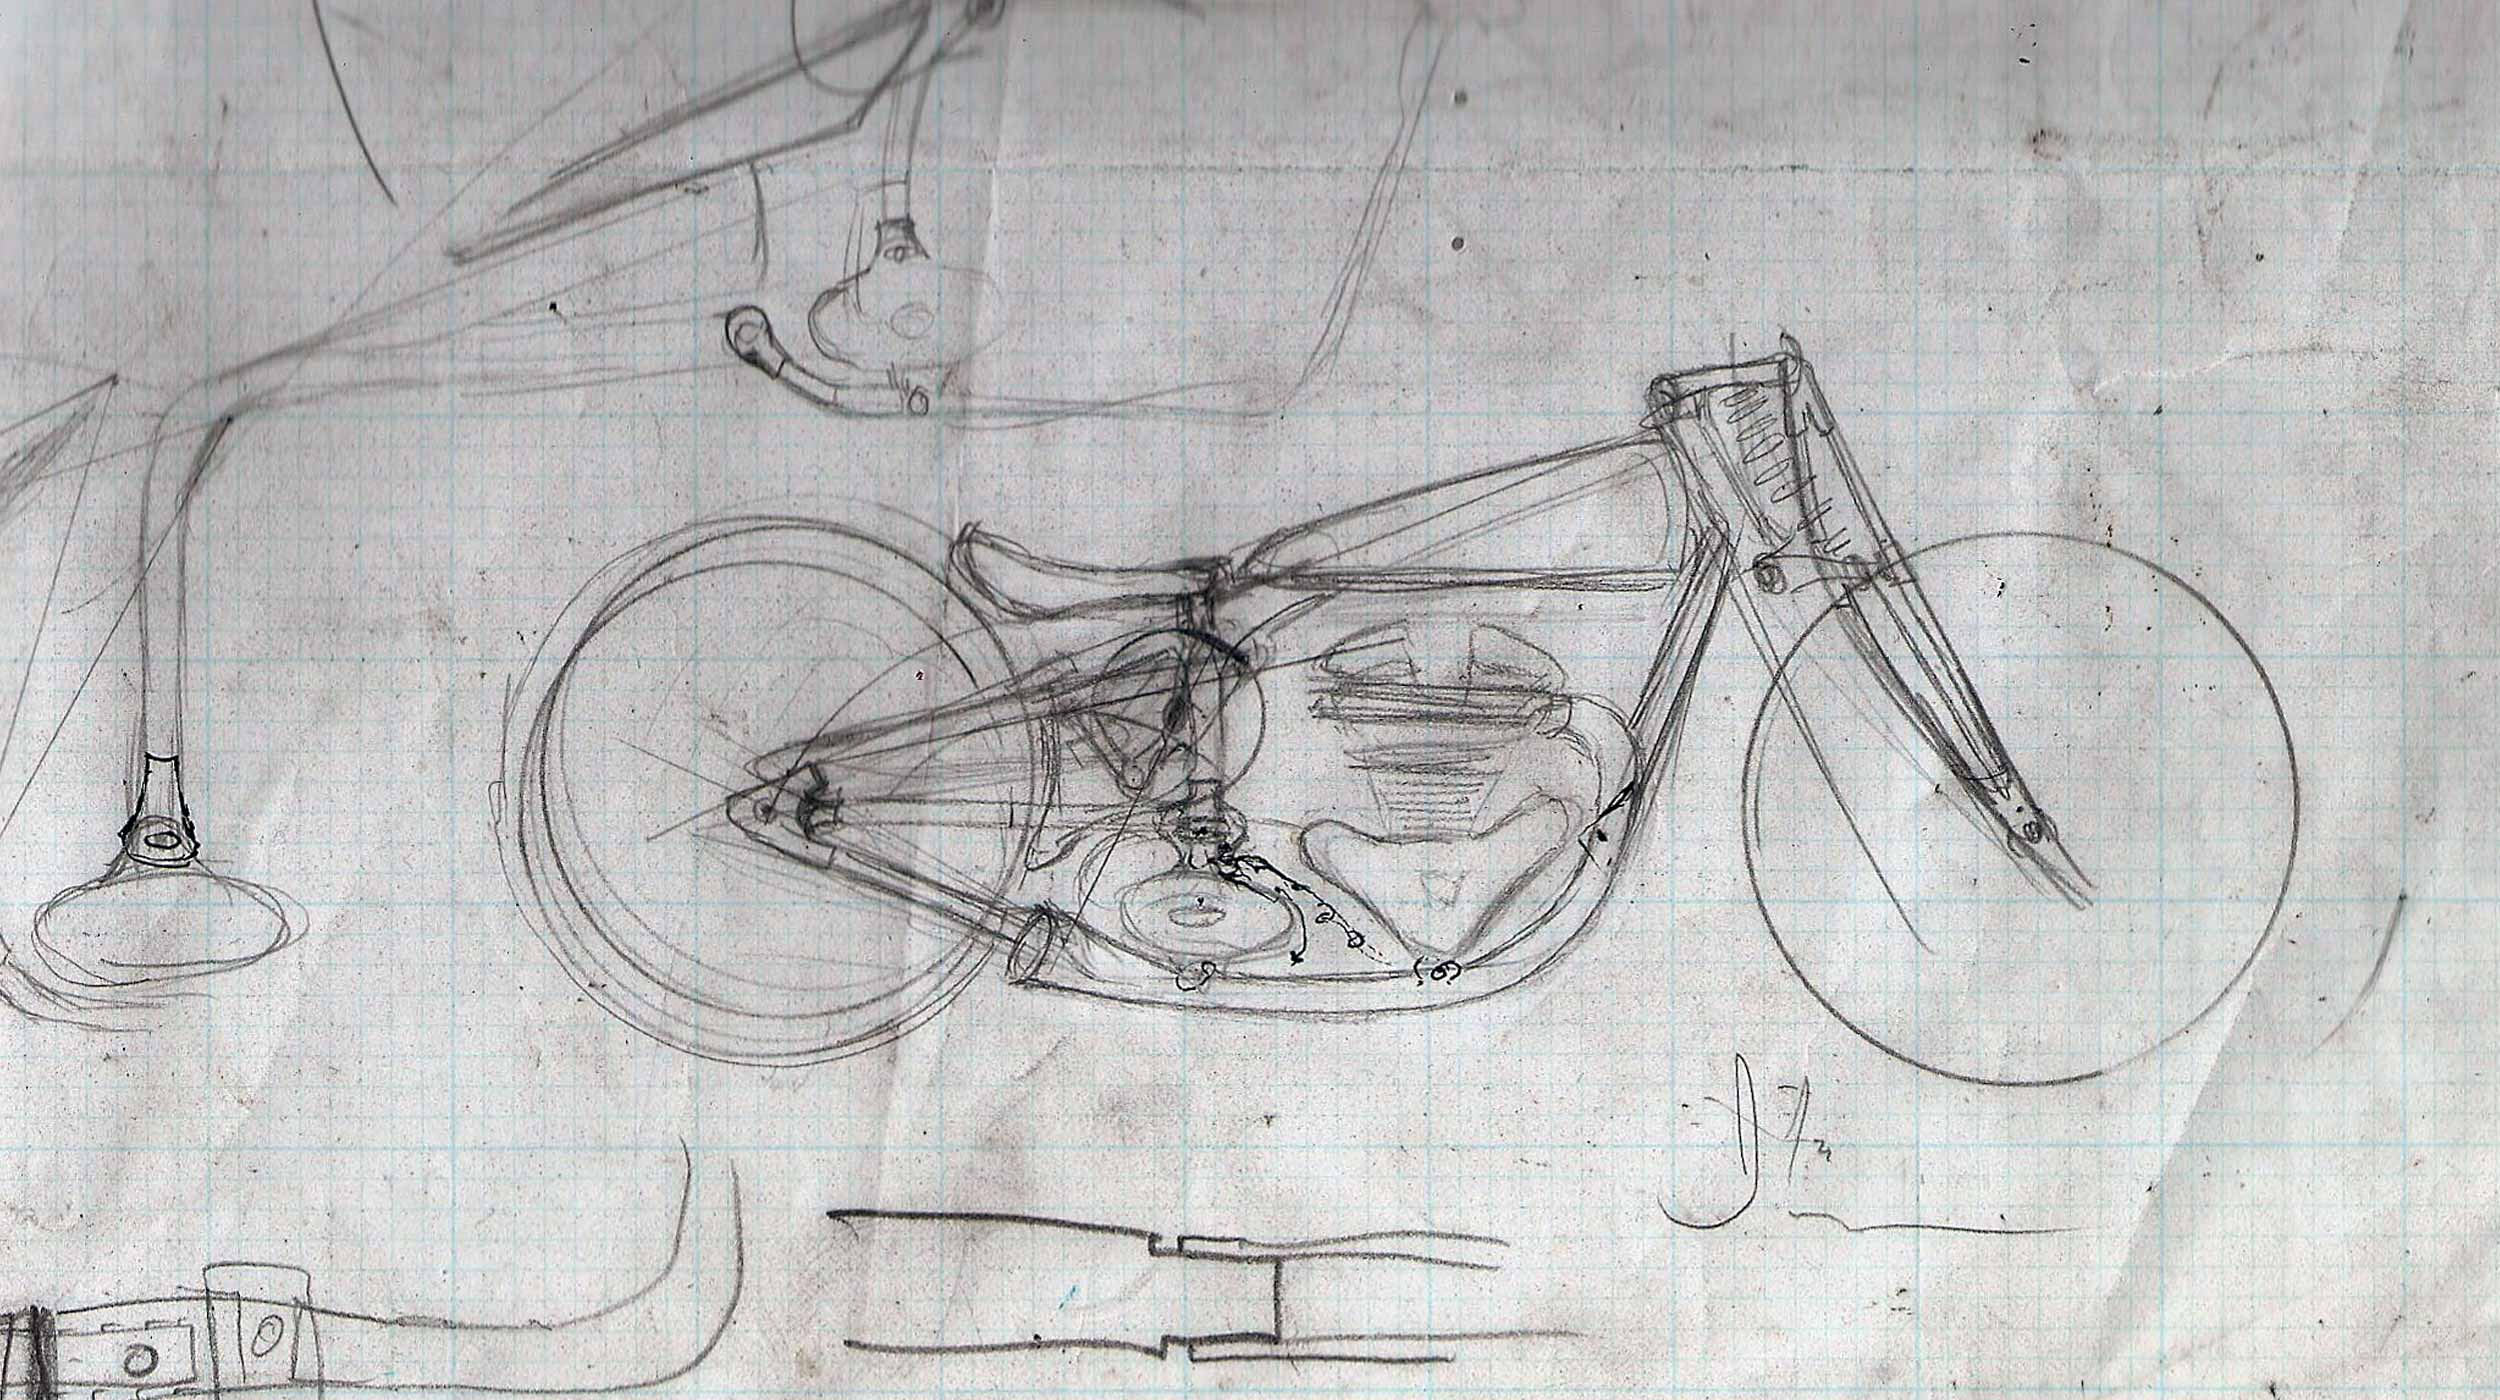 Kestrel-Sketch.jpg